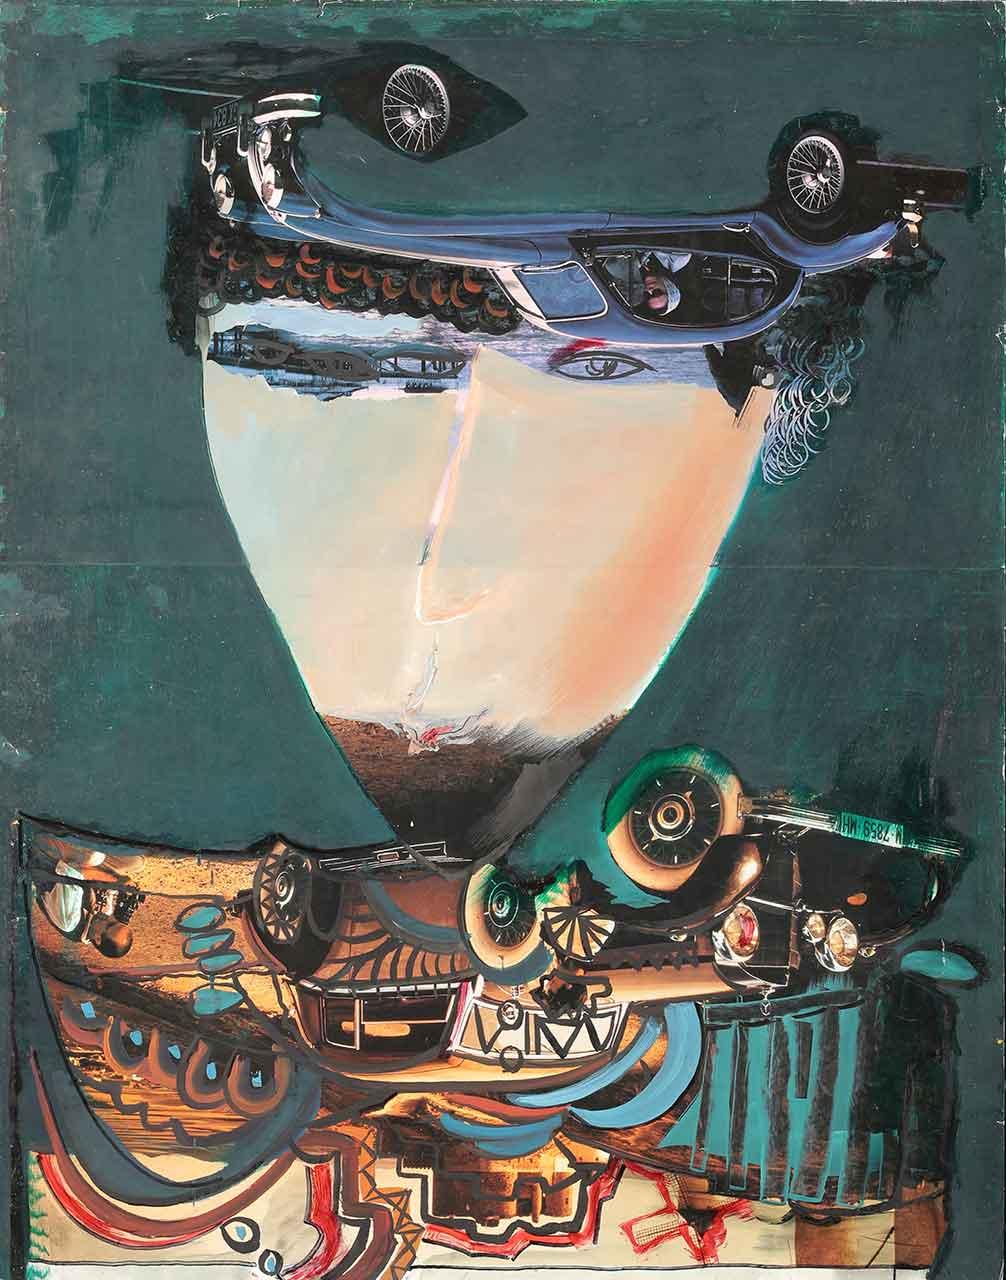 General. Temo Svirely, georgian-ukrainian artist (born 1965 in Georgia - died 2014 in Ukraine), gouache on paper, collage, 1993